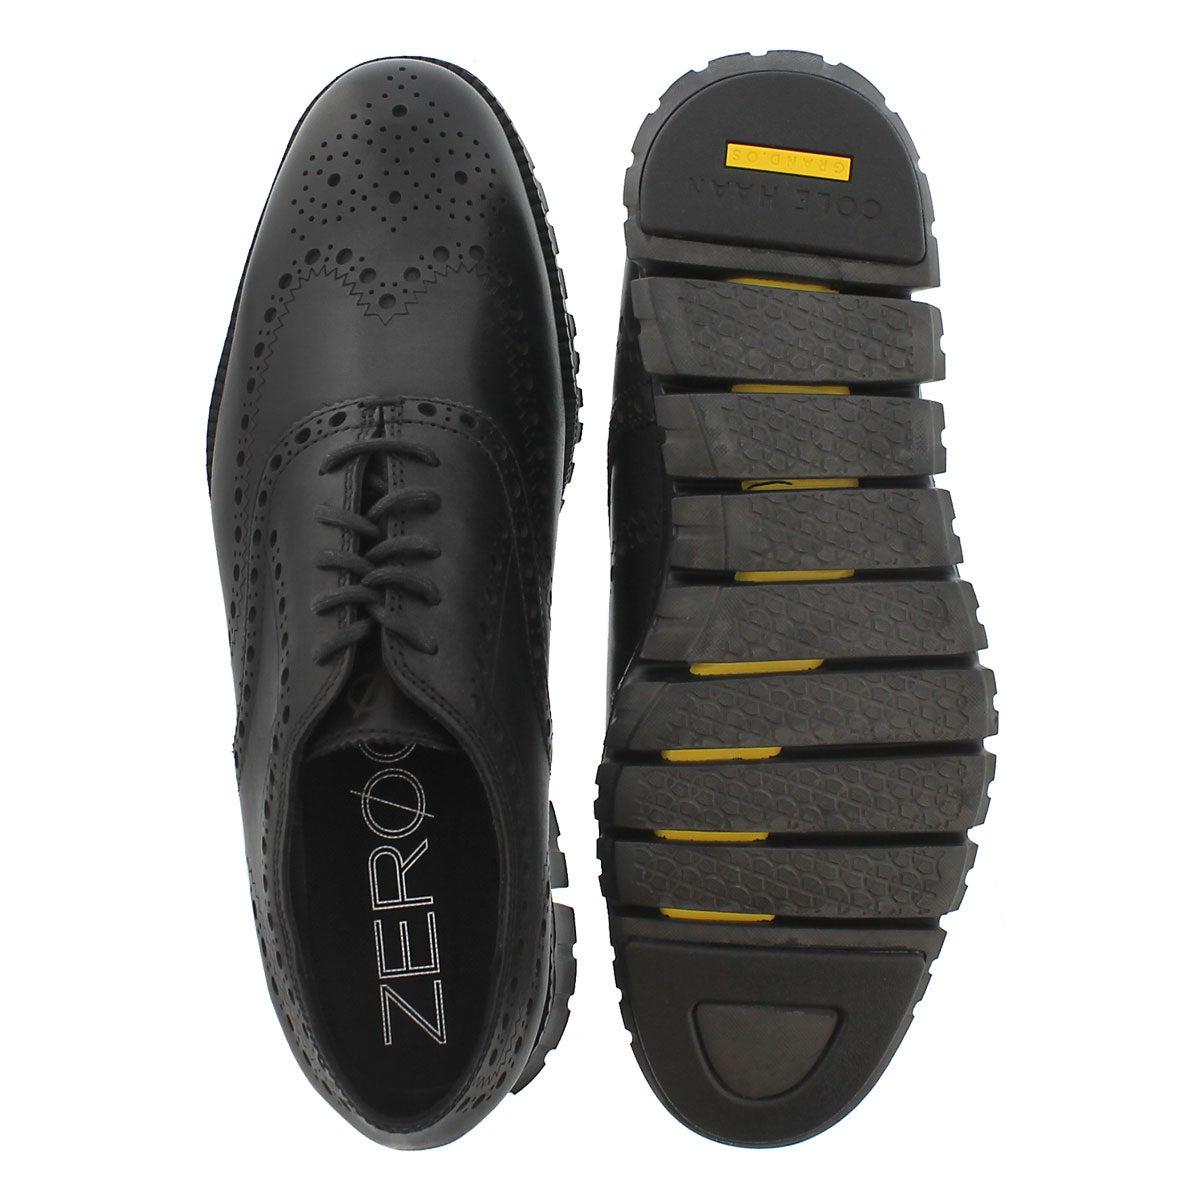 Mns Zerogrand Wing black dress oxford